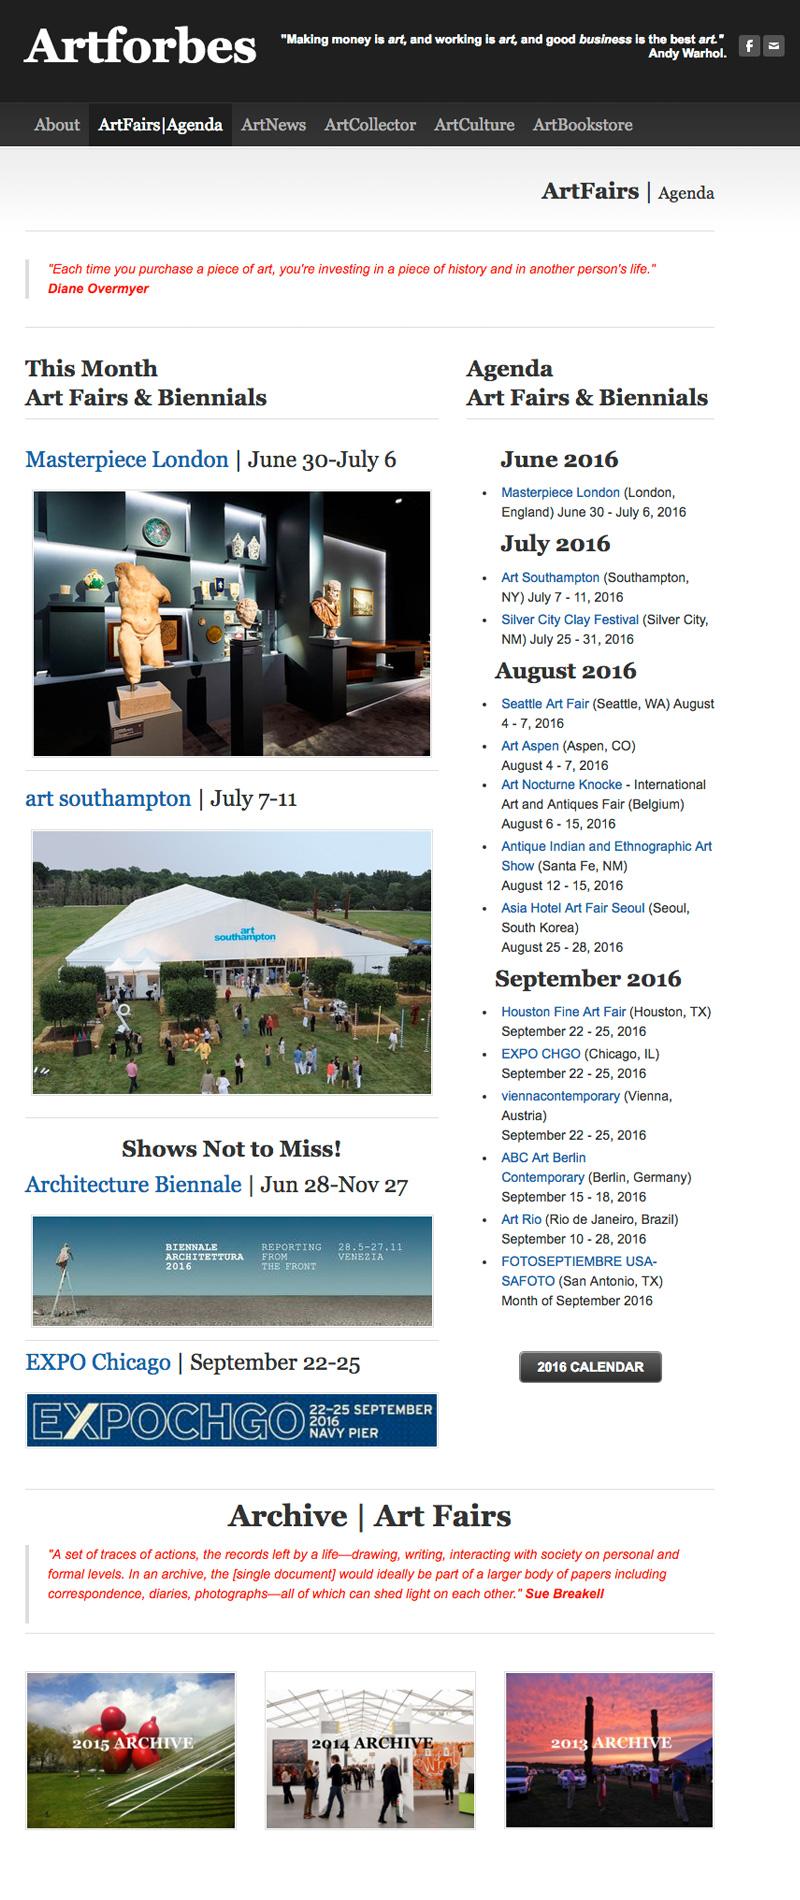 2016-FOTOSEPTIEMBRE-USA_Artfairs-Agenda_July_Artforbes